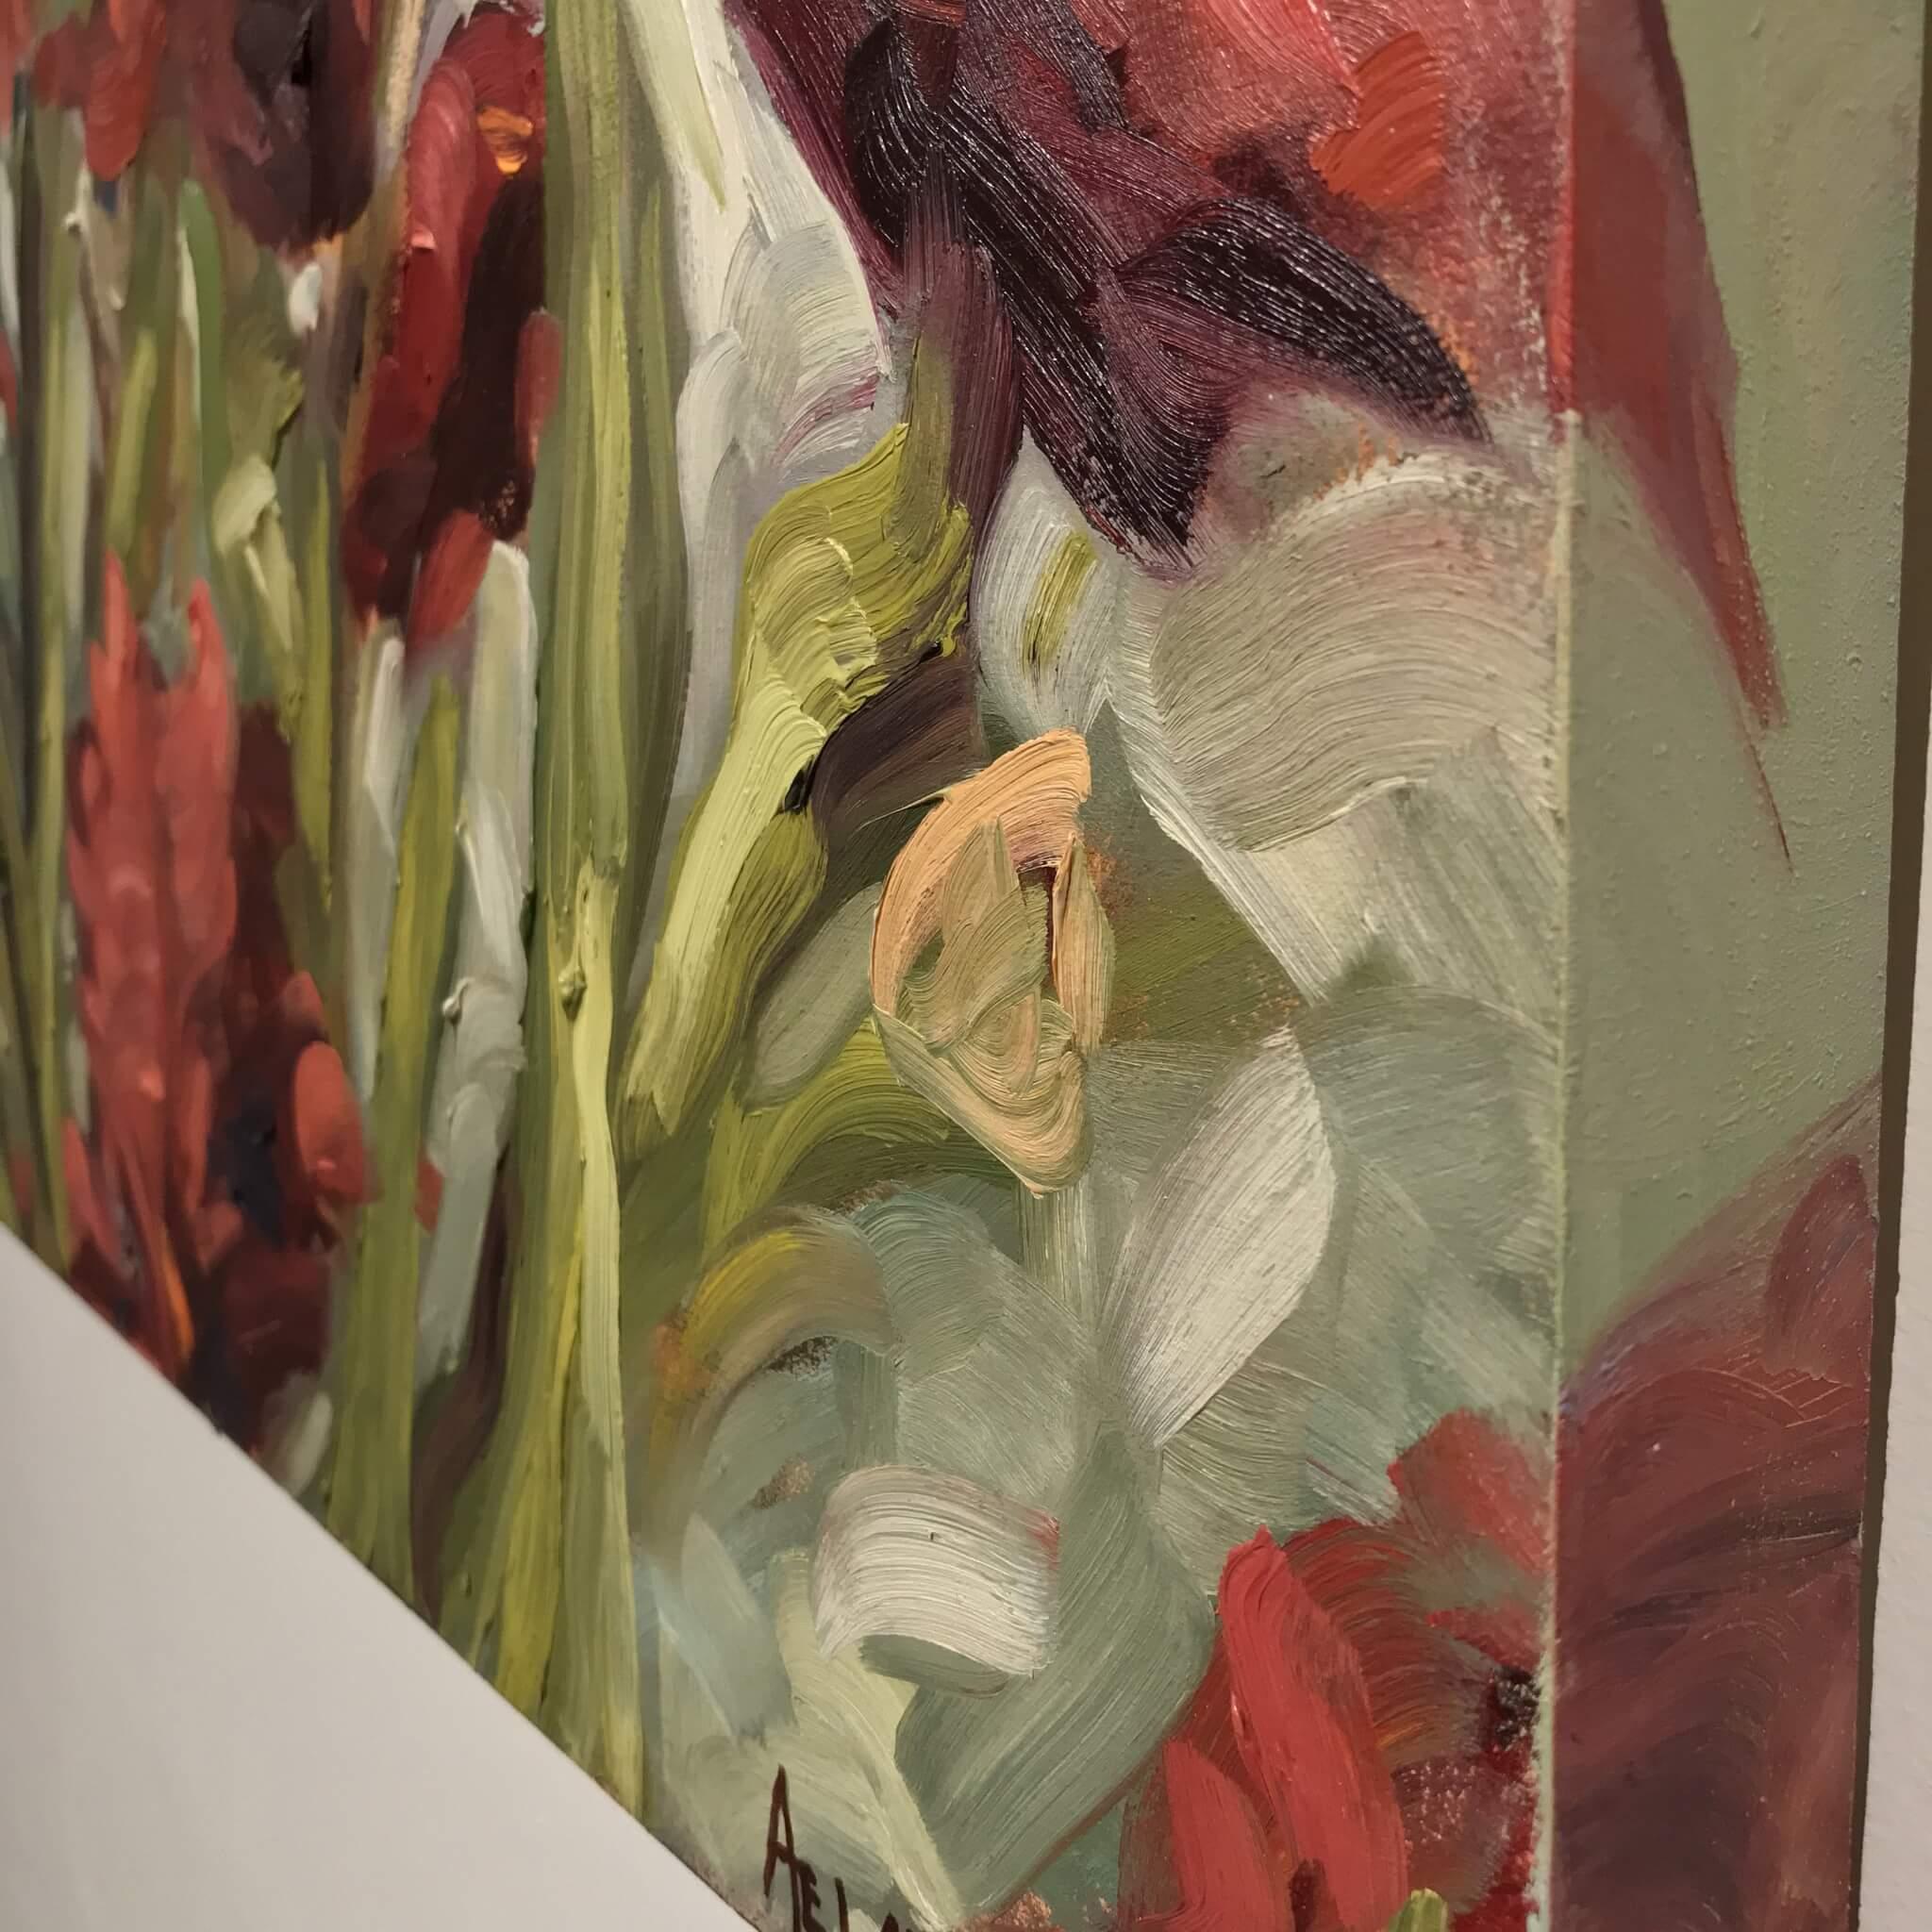 Ann Willsie Maroon Irises 36x24 D2